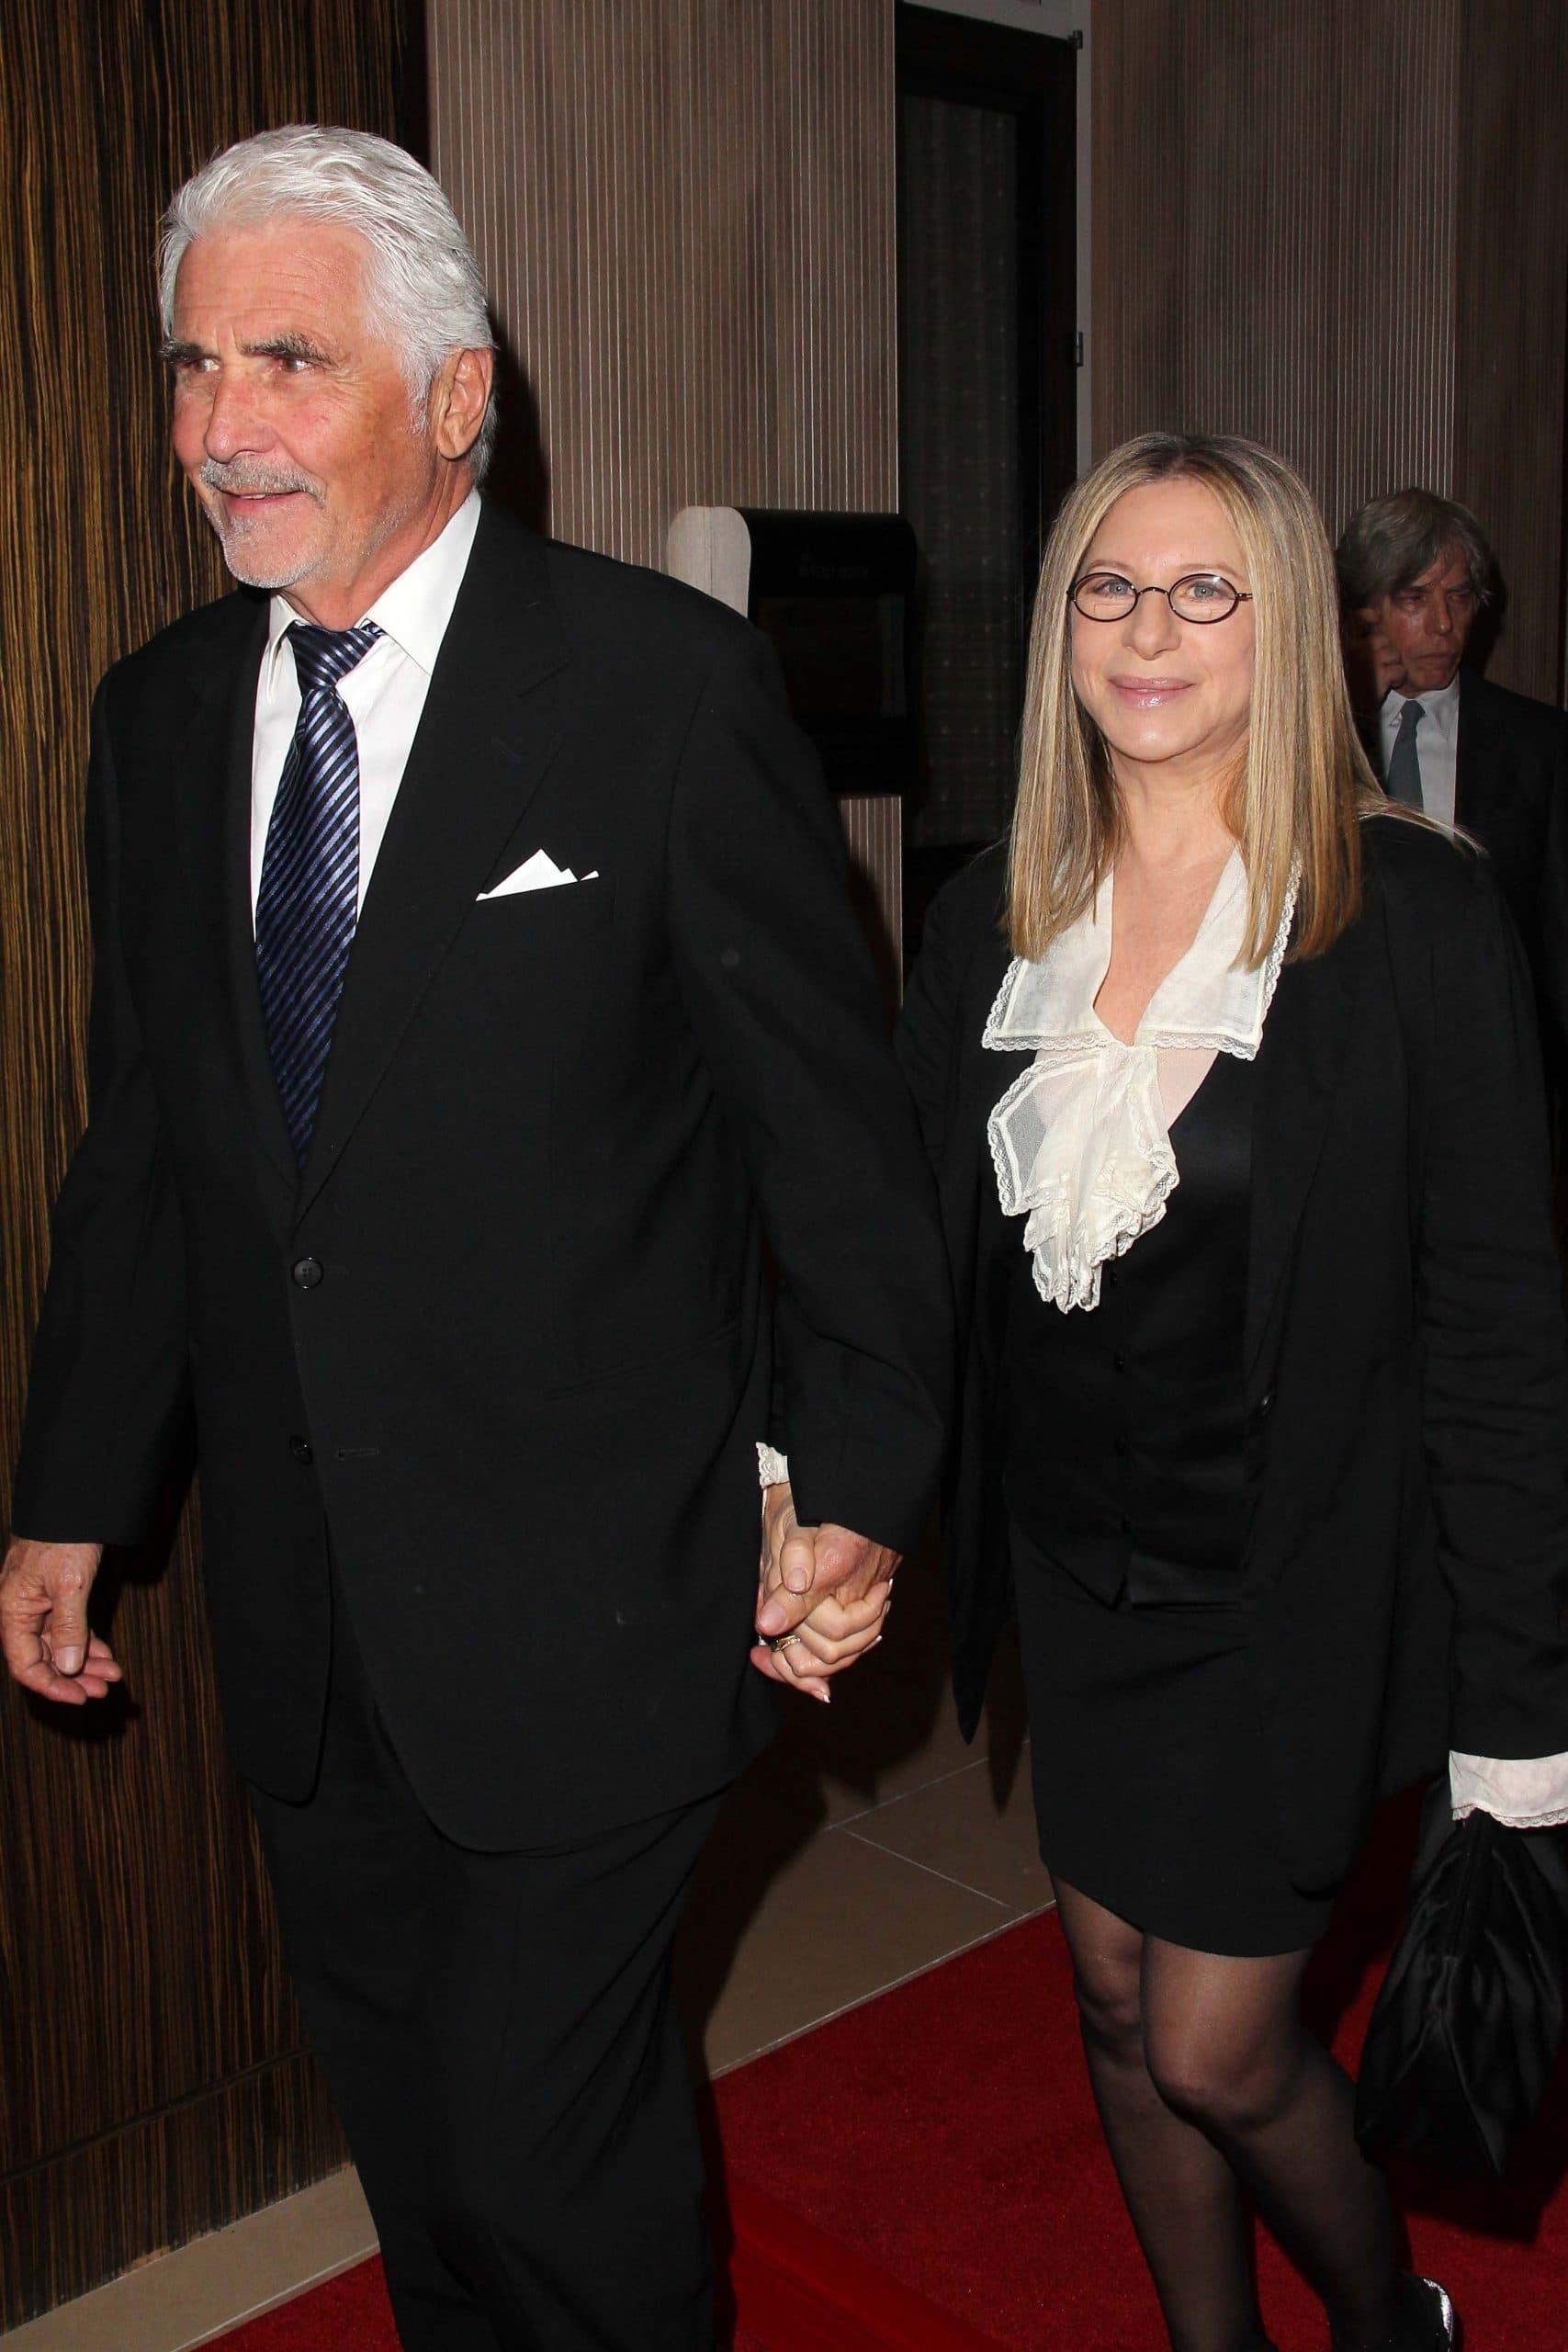 James Brolin, Barbara Streisand at the Cedars-Sinai Board Of Governors